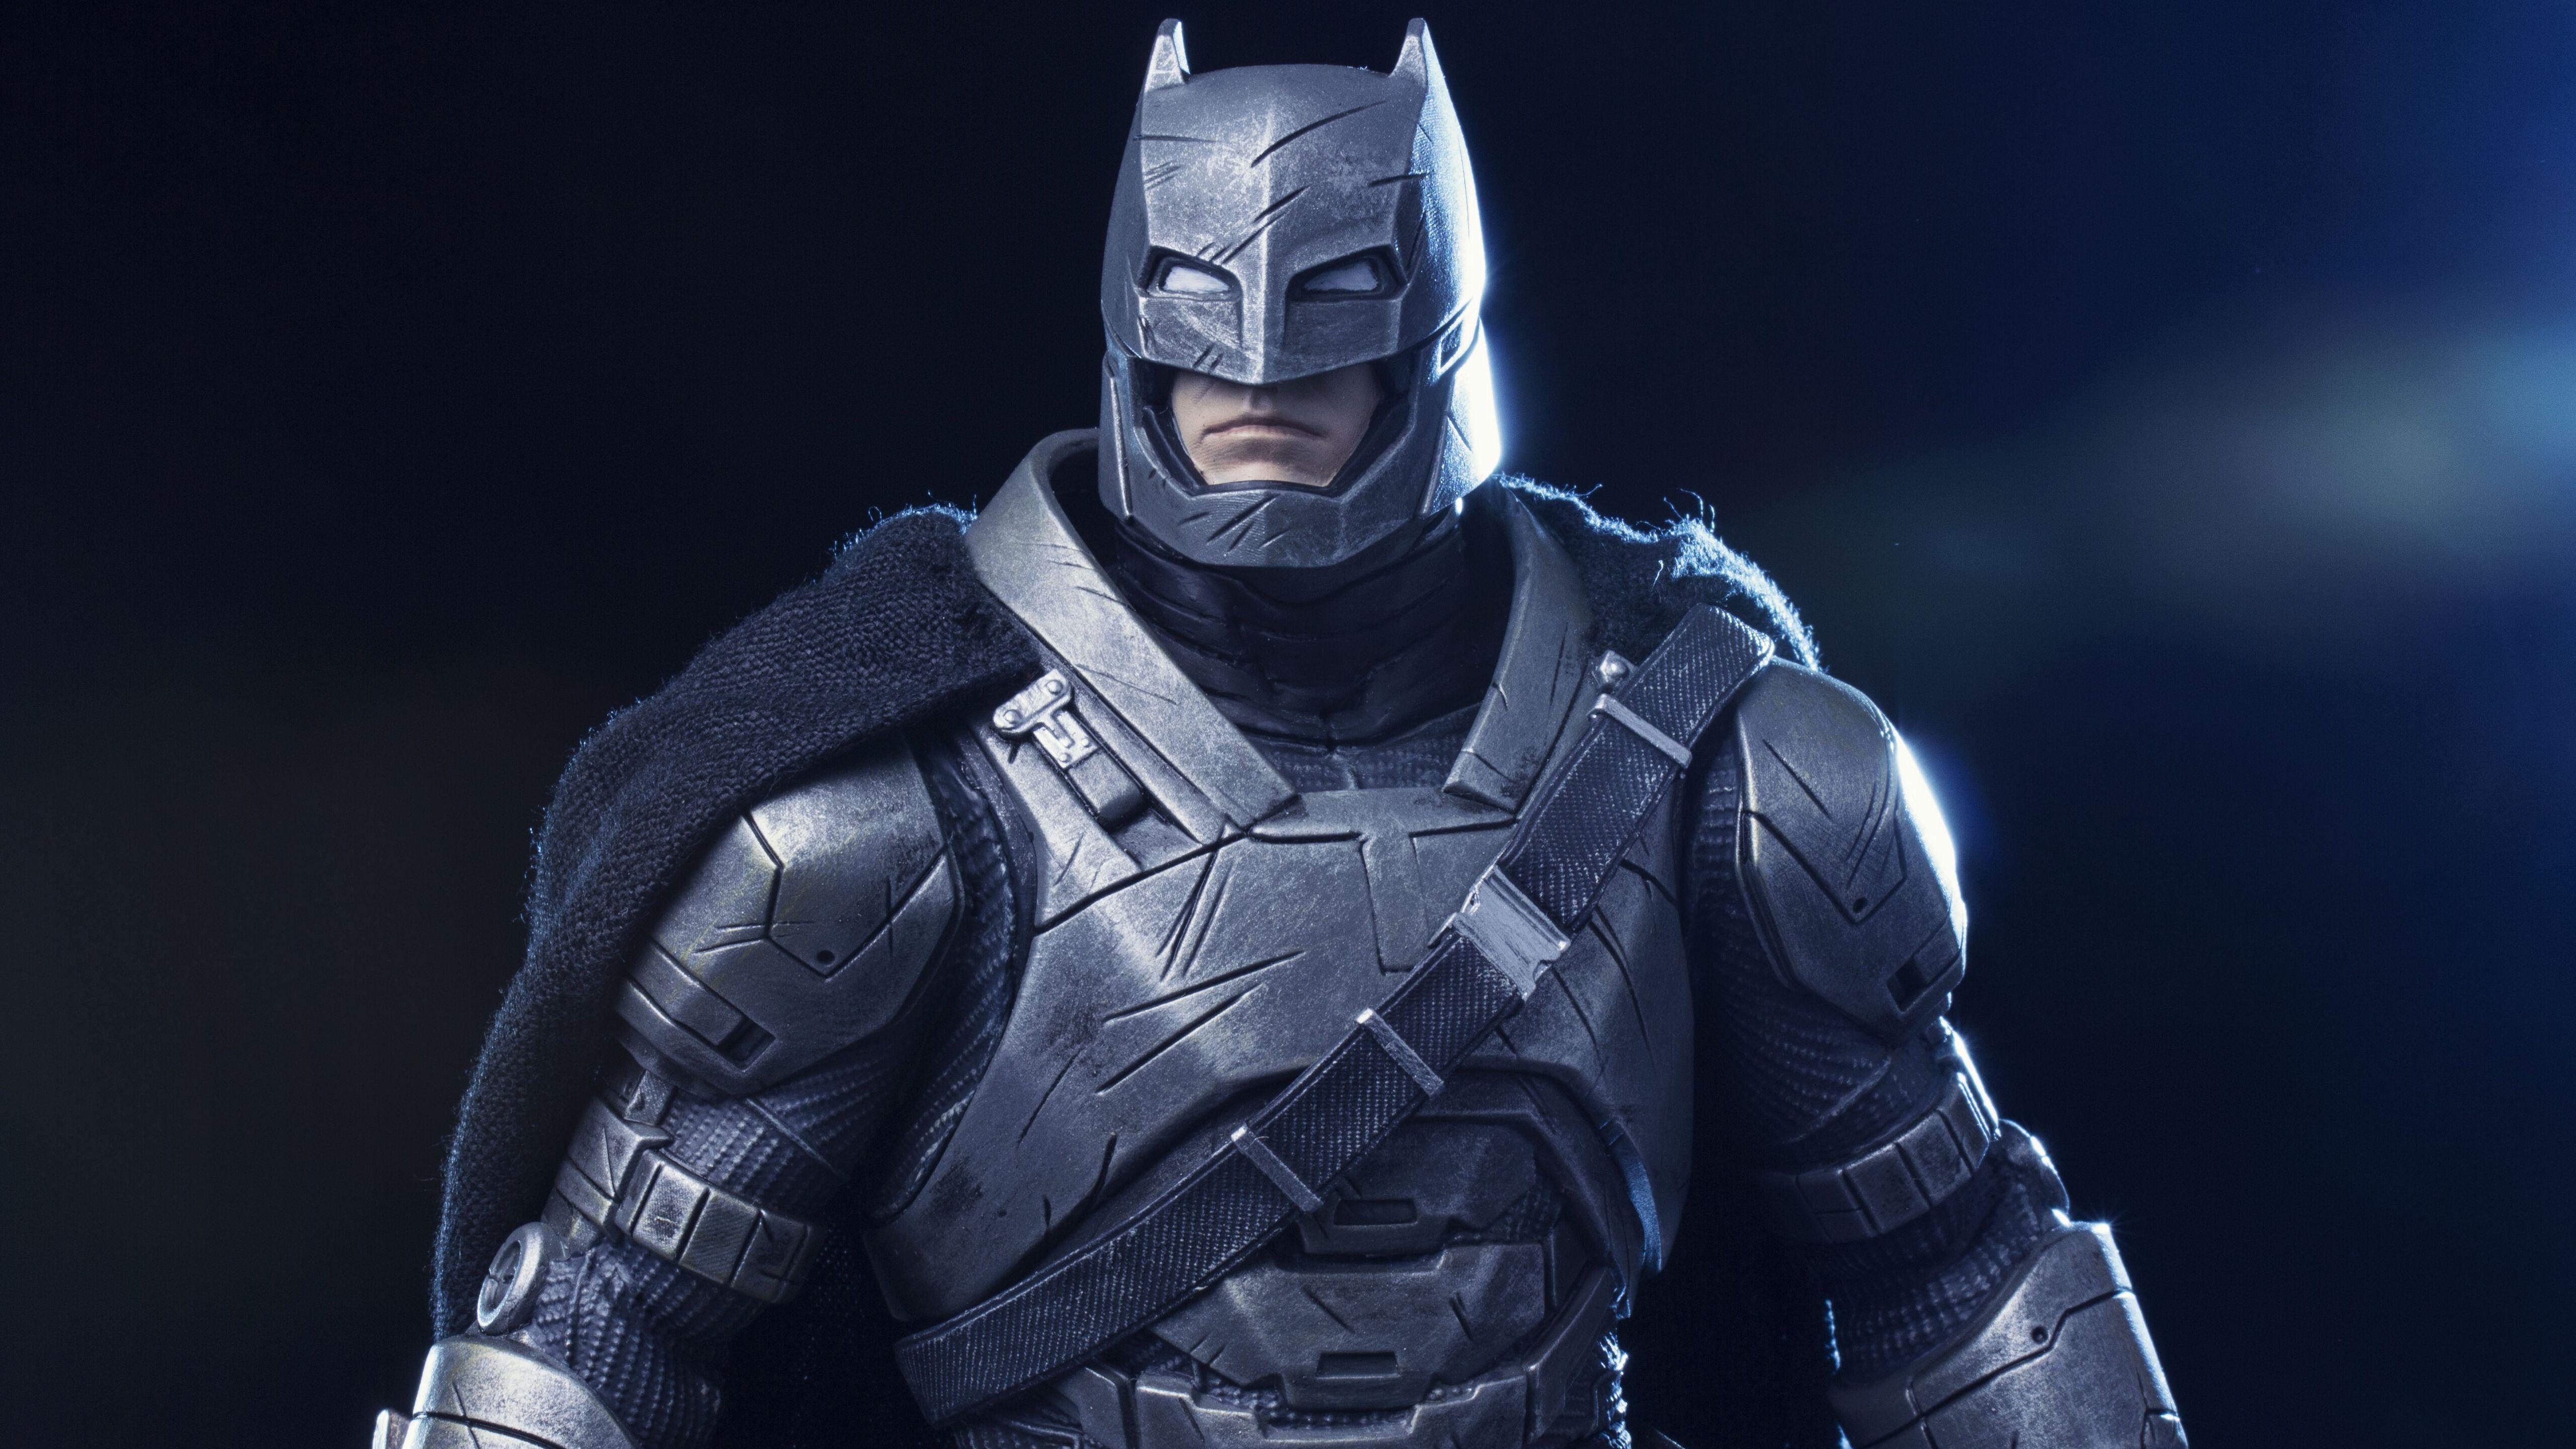 batman-bat-suit-5k-im.jpg